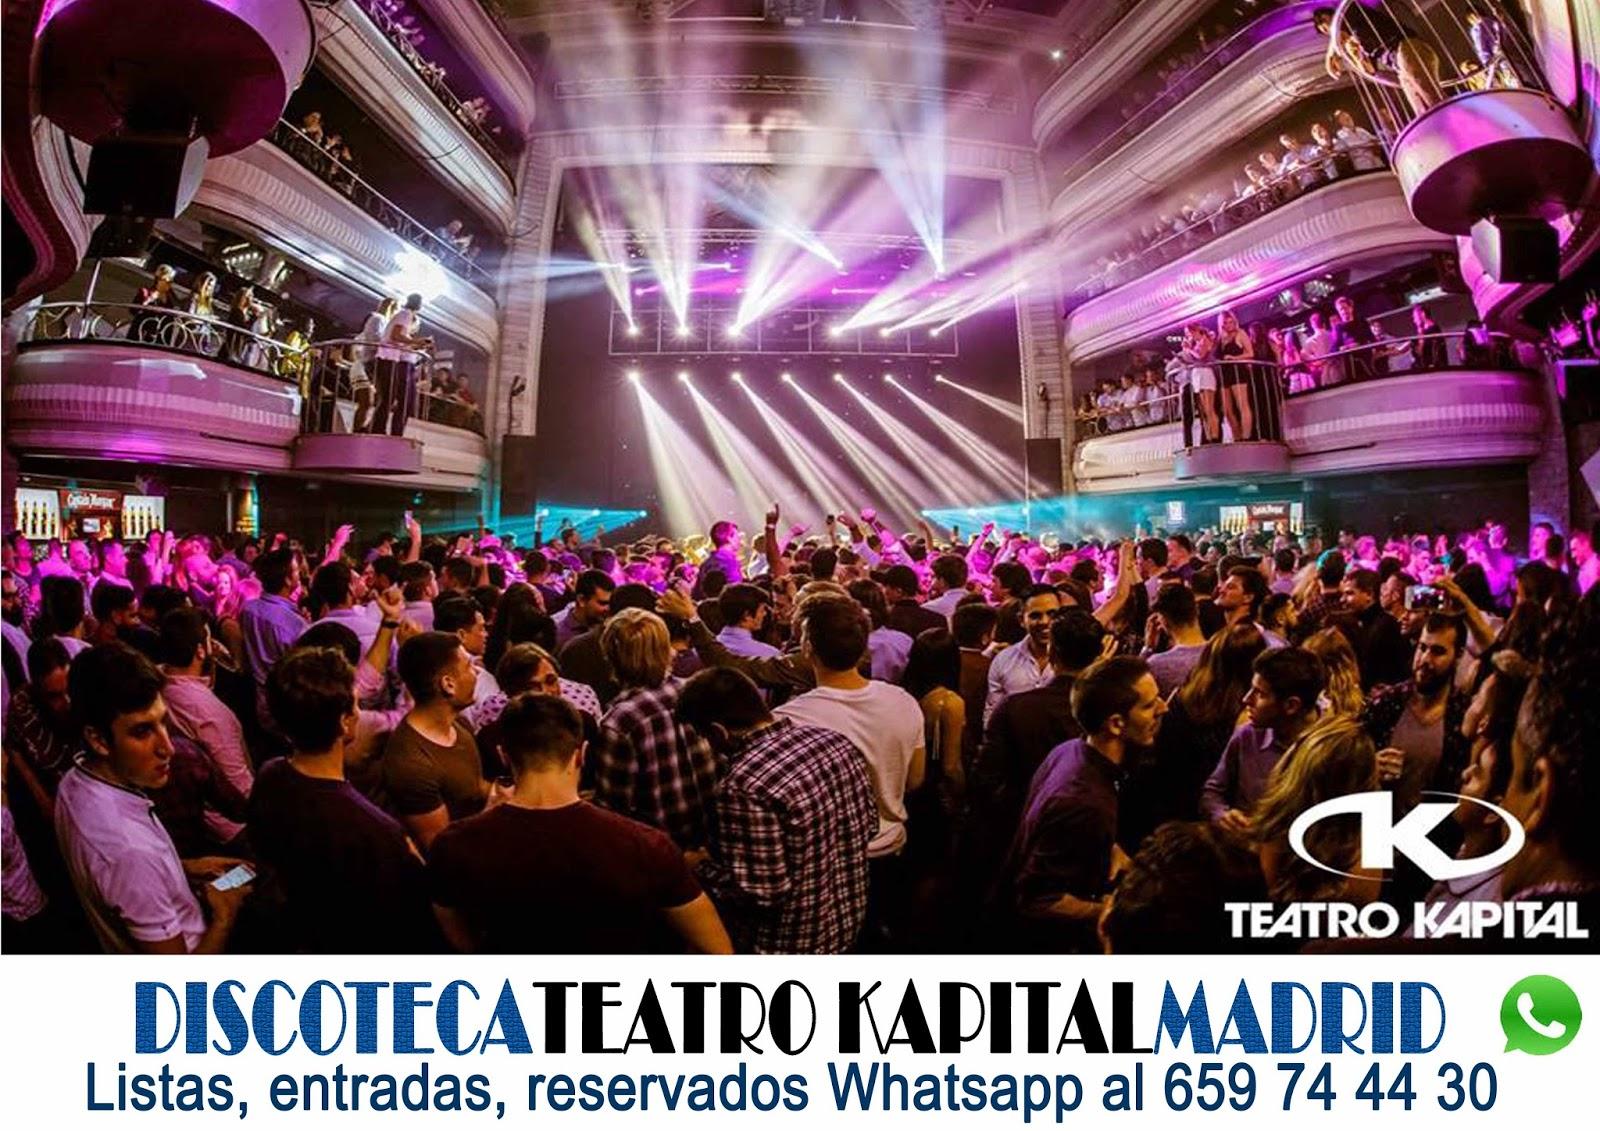 Discoteca kapital madrid 659 744 430 whatsapp fiestas for Kapital jueves gratis